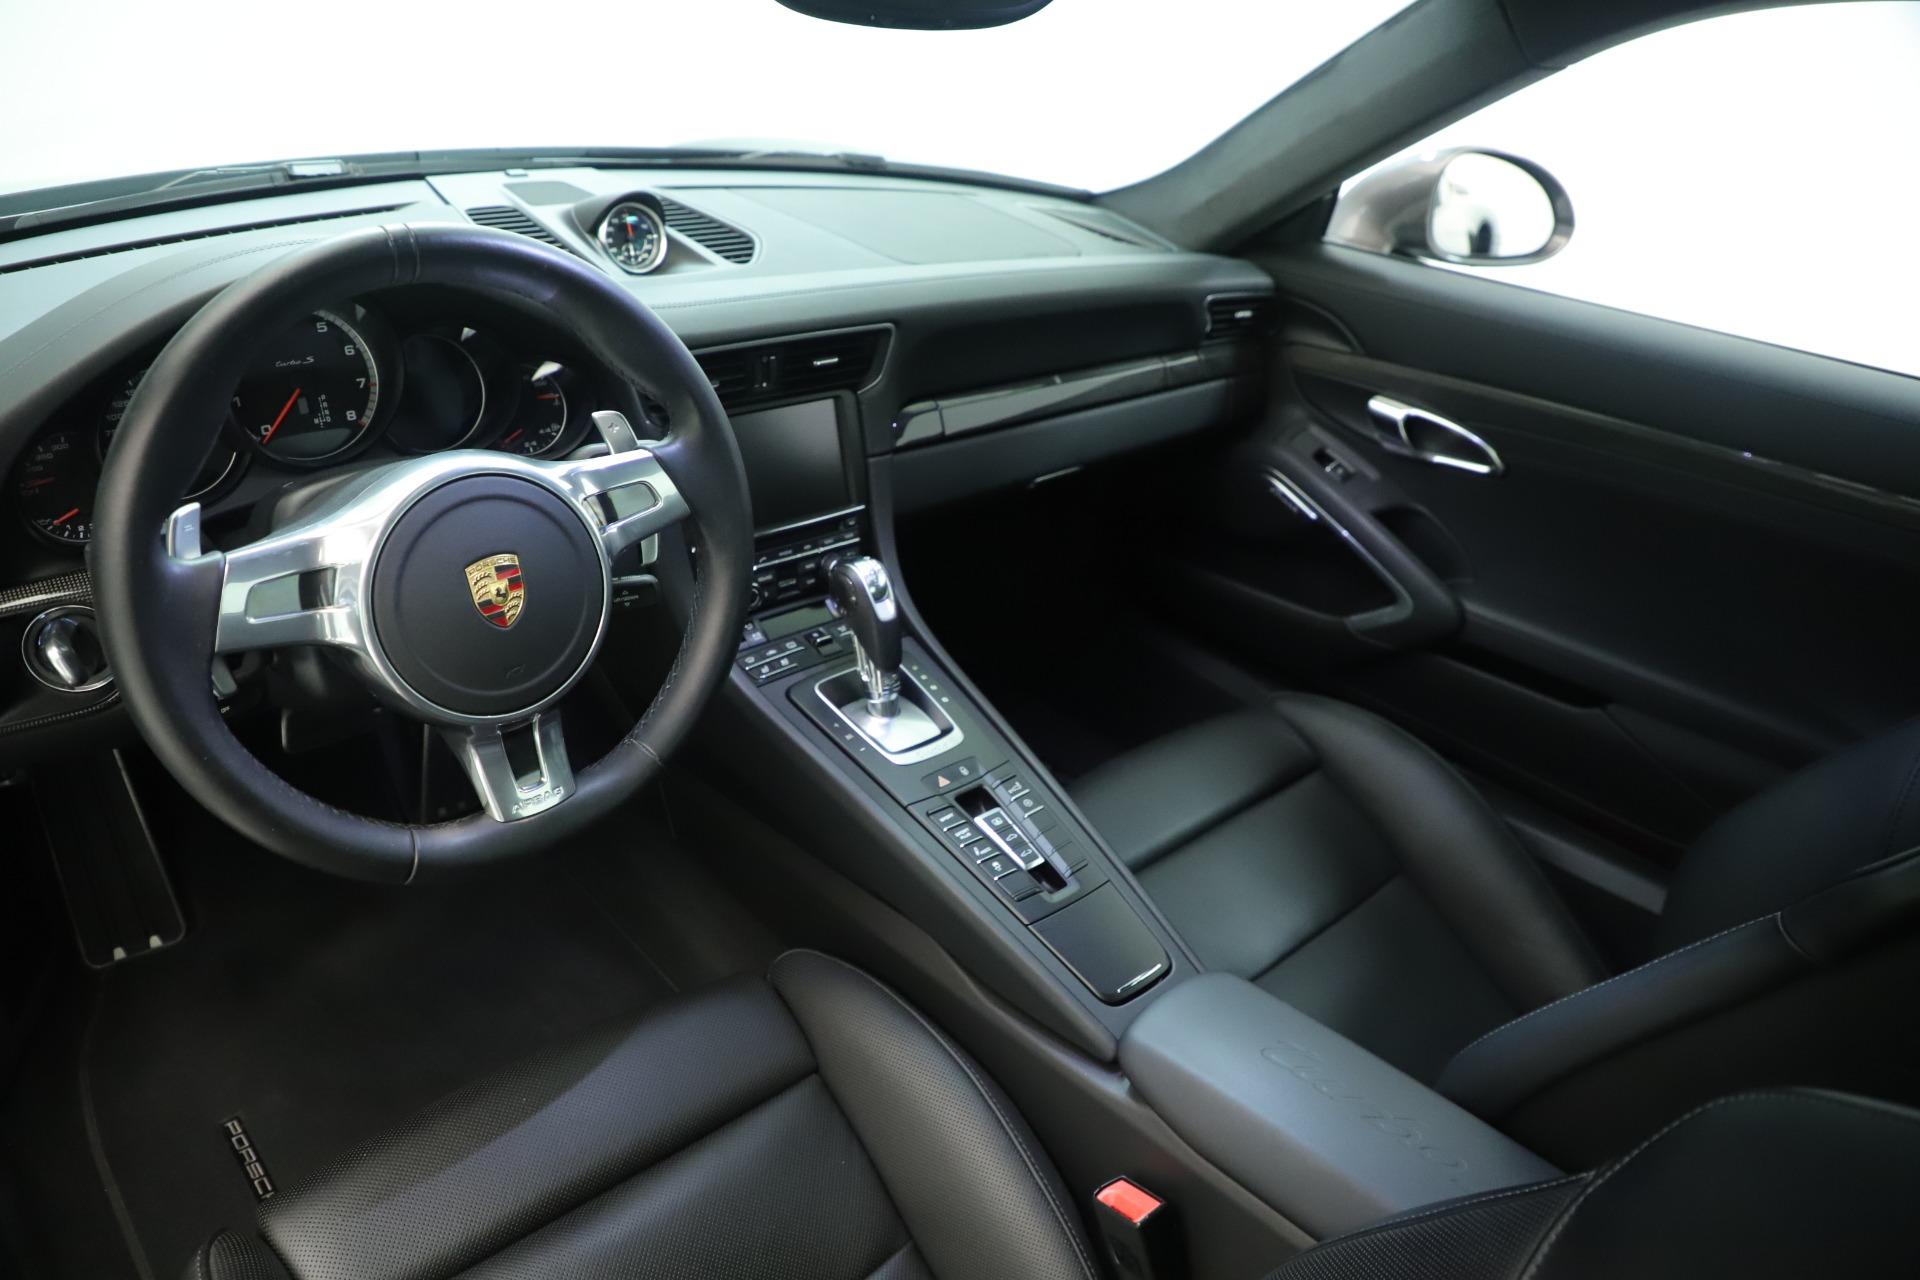 Used 2015 Porsche 911 Turbo S For Sale In Greenwich, CT 3429_p14